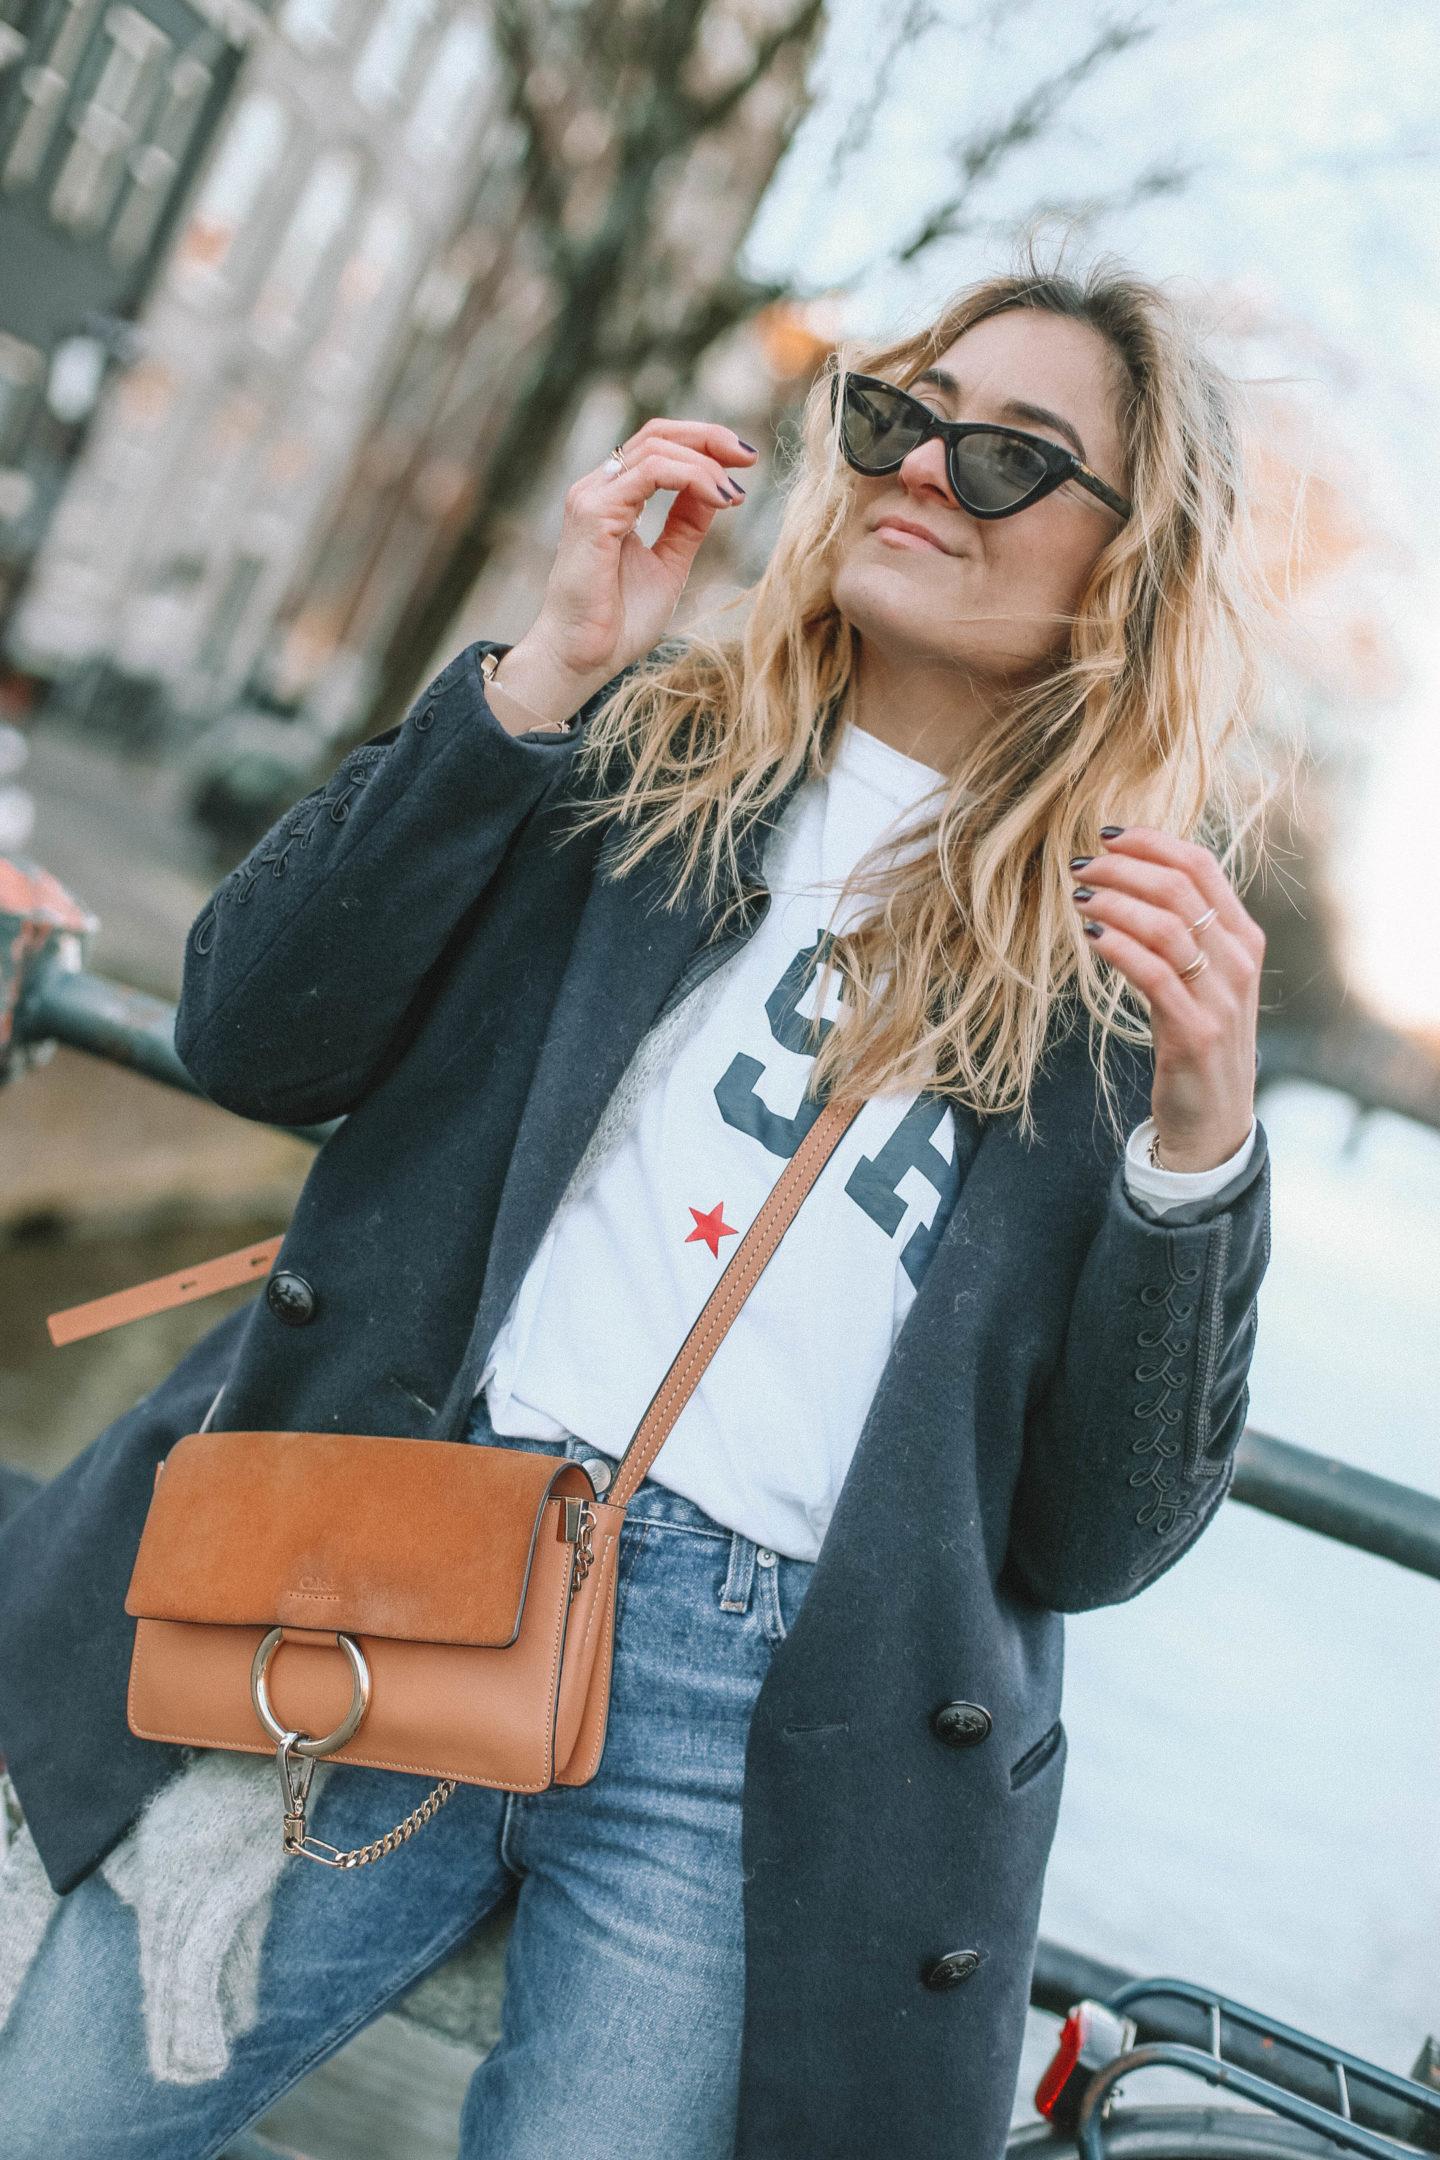 Lunette de soleil cat-eye Mango - Blondie baby blog mode et voyages